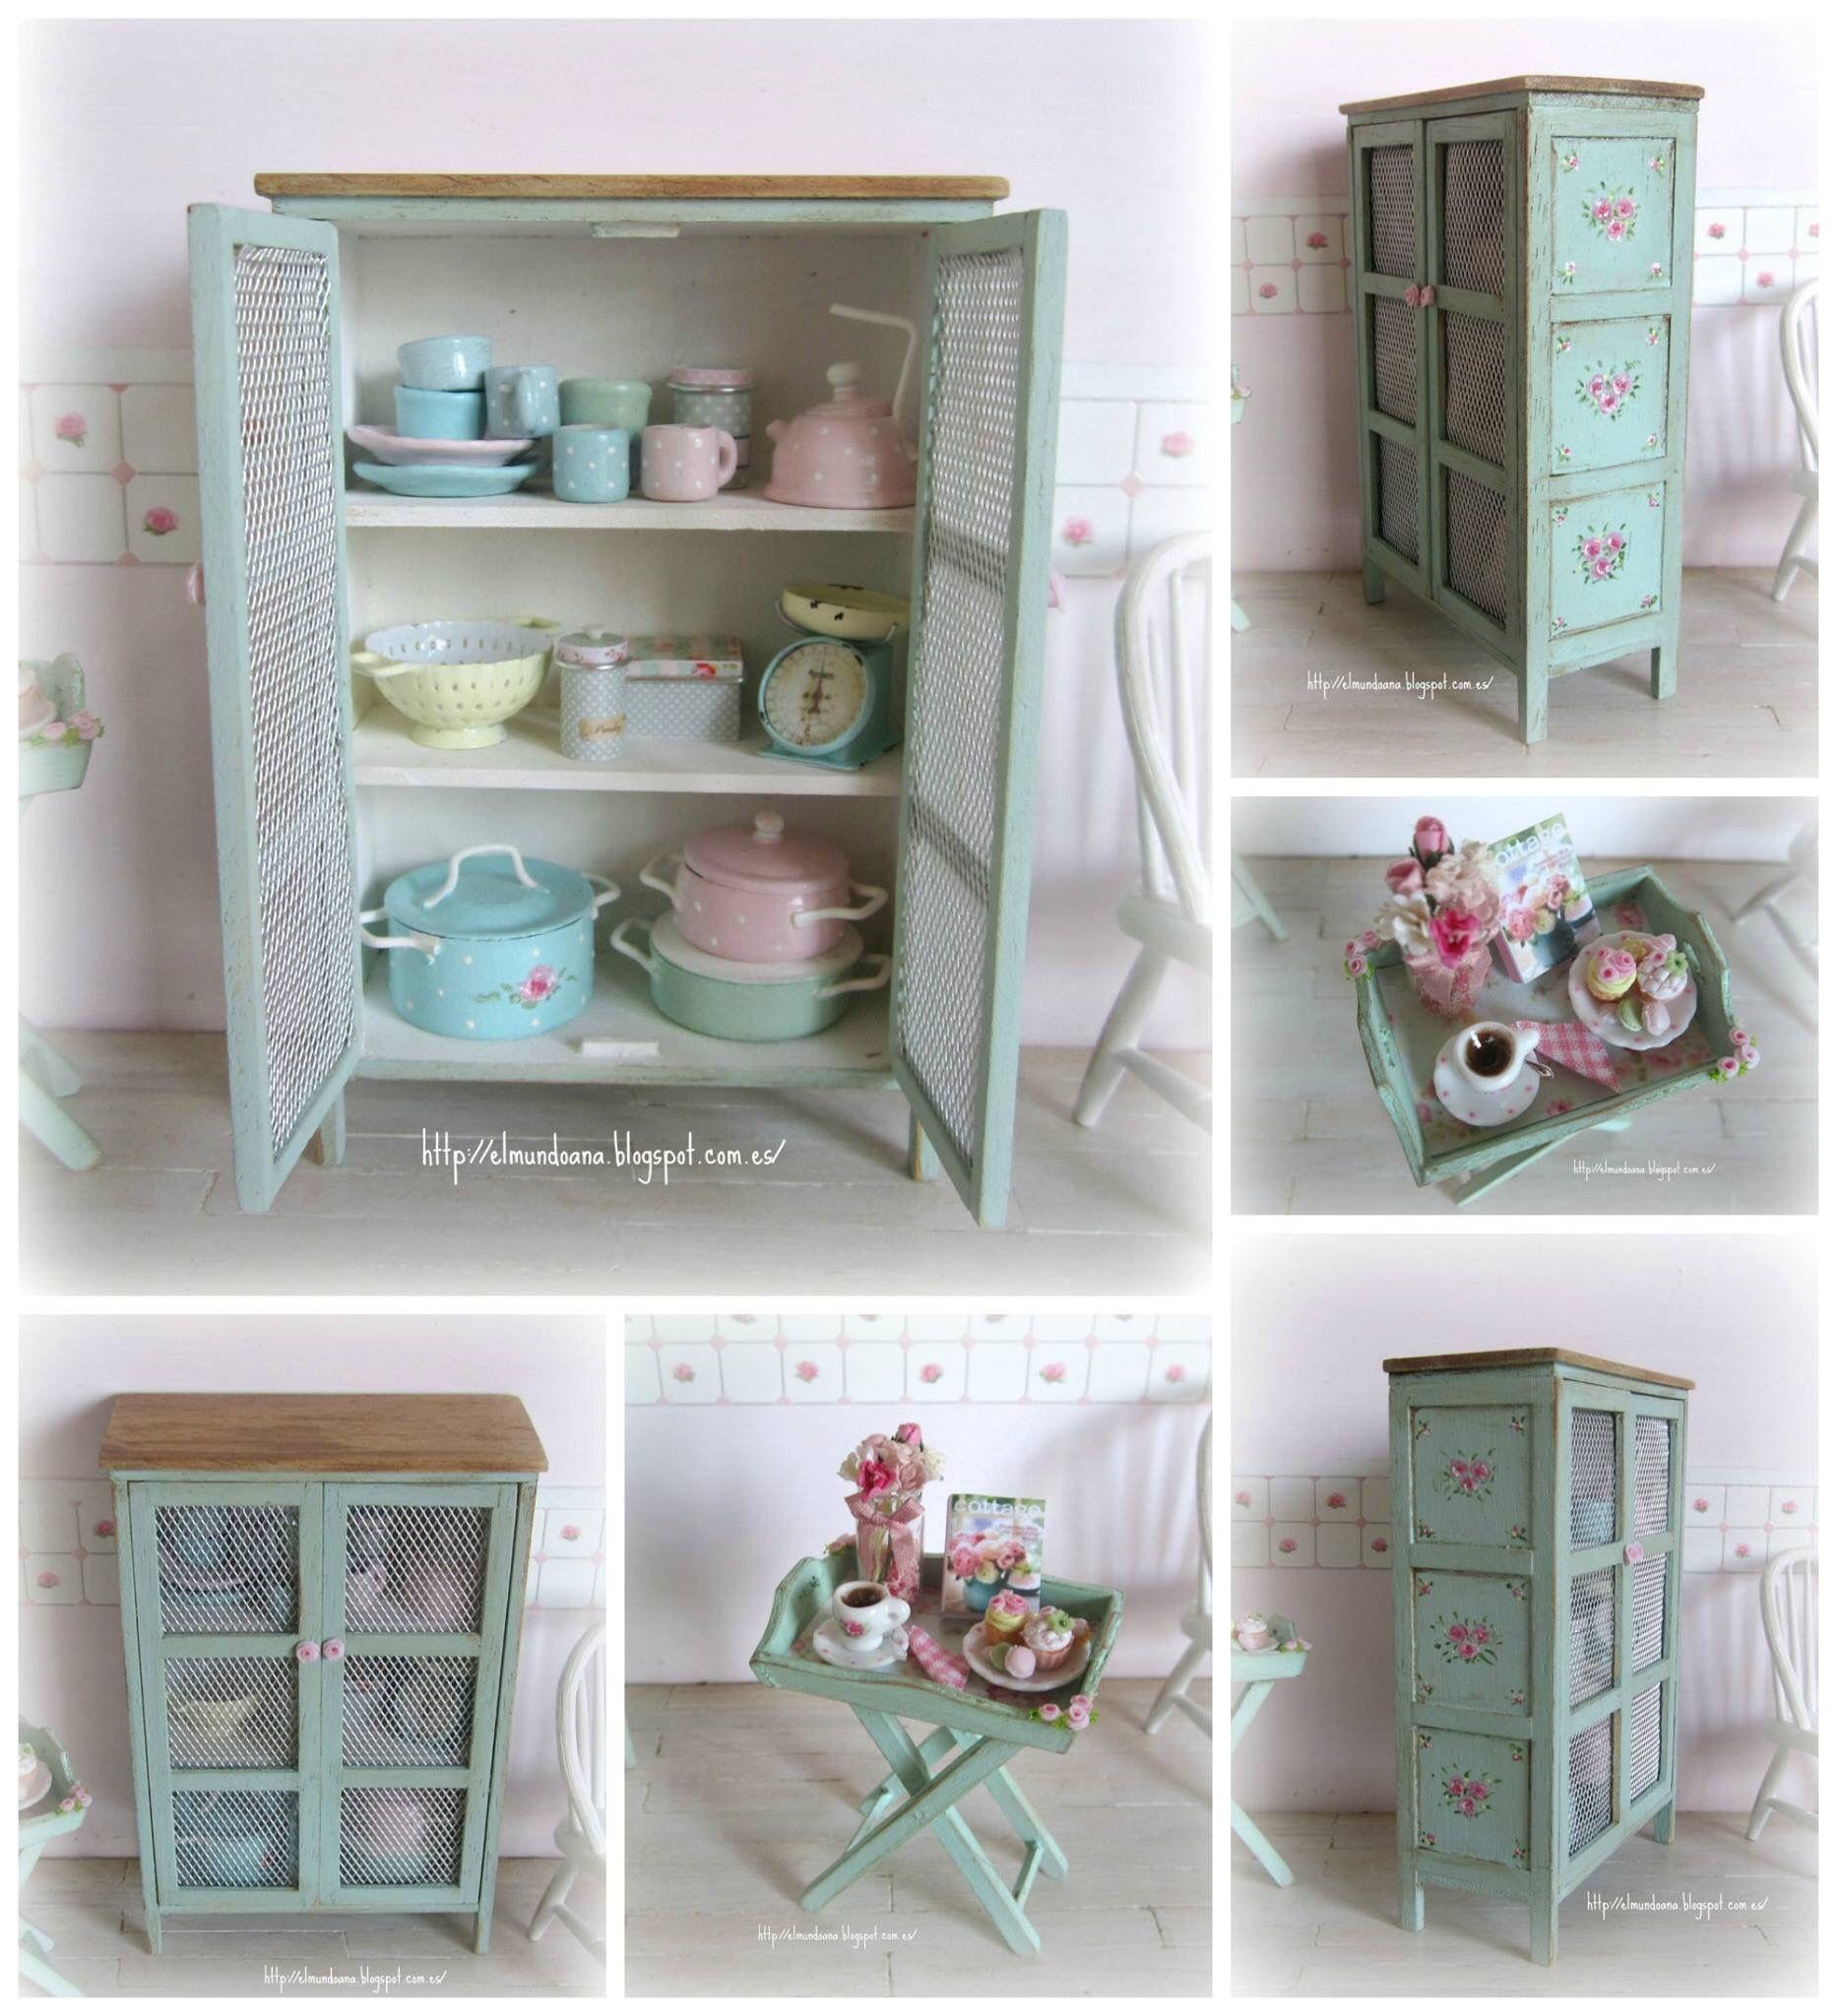 Attractive Dollhouse Miniatures · Deko BlumenMiniaturmöbelPuppenhausmöbelSelbstgemachte  MöbelKühlschrankMiniatur ...